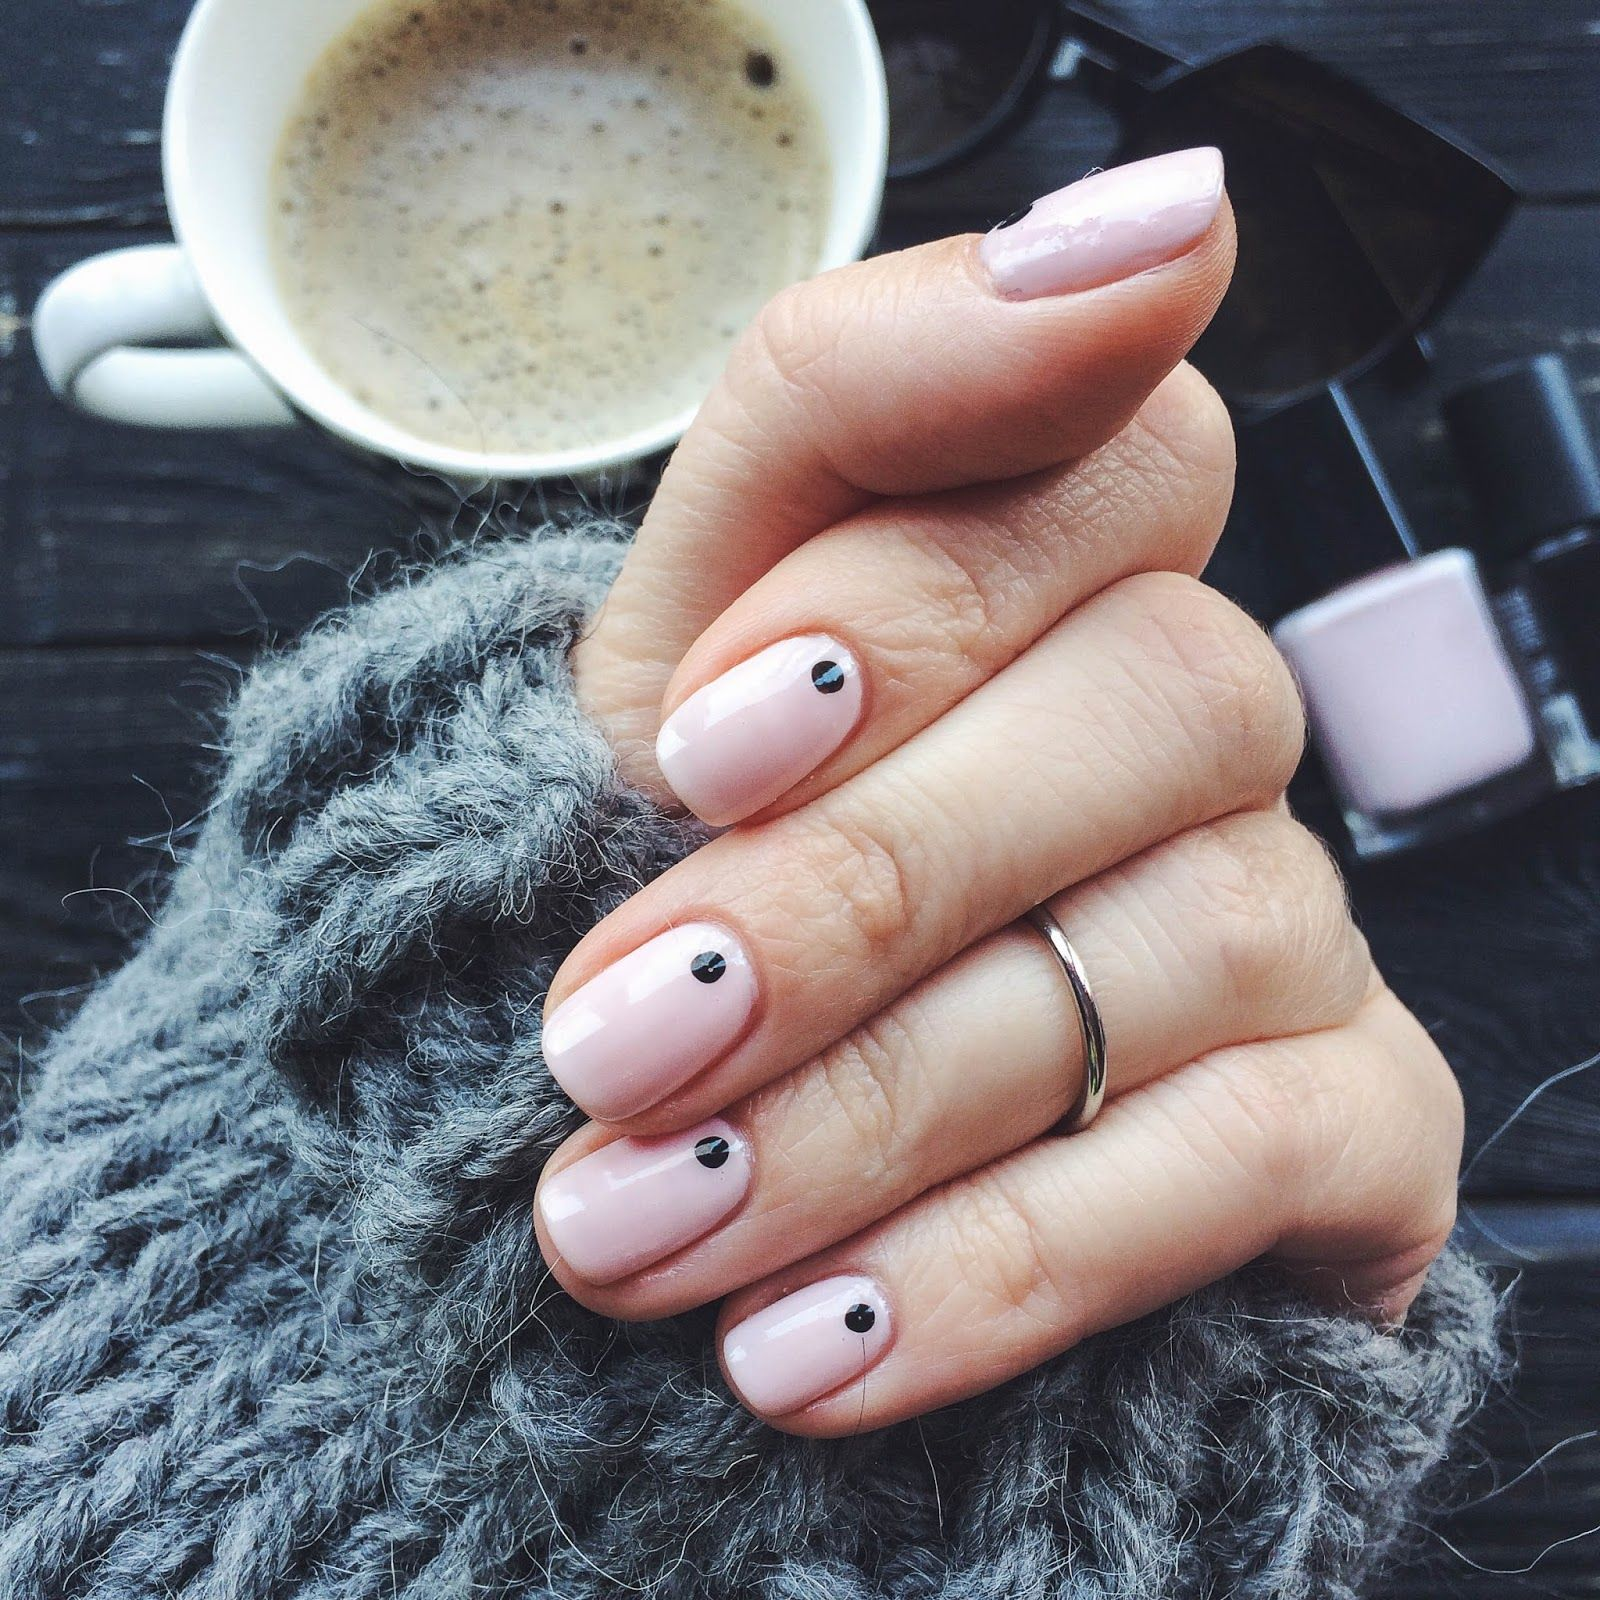 janekhodos: Nails: neutral with dots | beauty-full | Pinterest ...